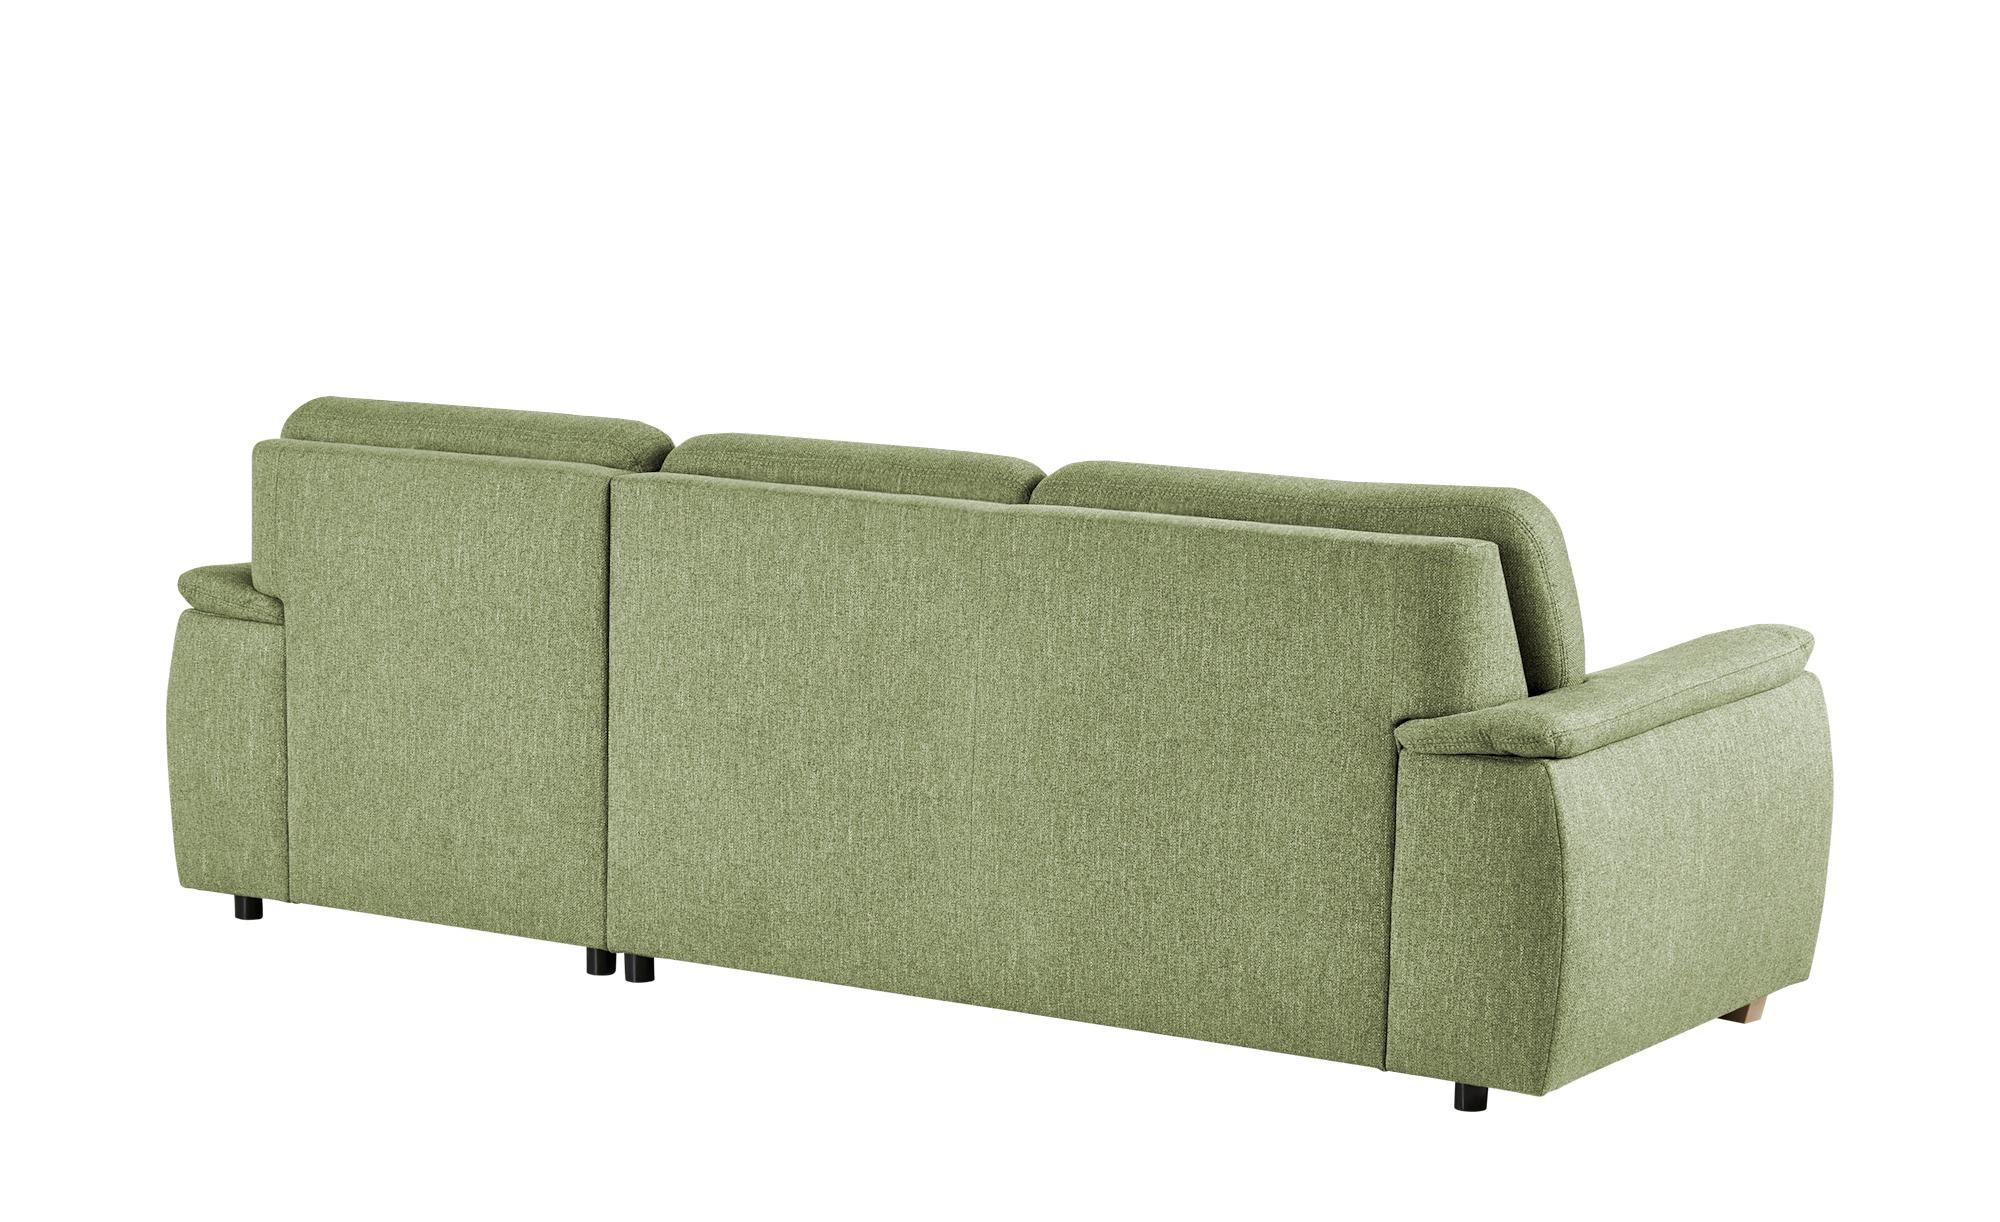 smart Ecksofa grün - Webstoff Valencia ¦ grün ¦ Maße (cm): B: 281 H: 90 T: 170 Polstermöbel > Sofas > Ecksofas - Höffner